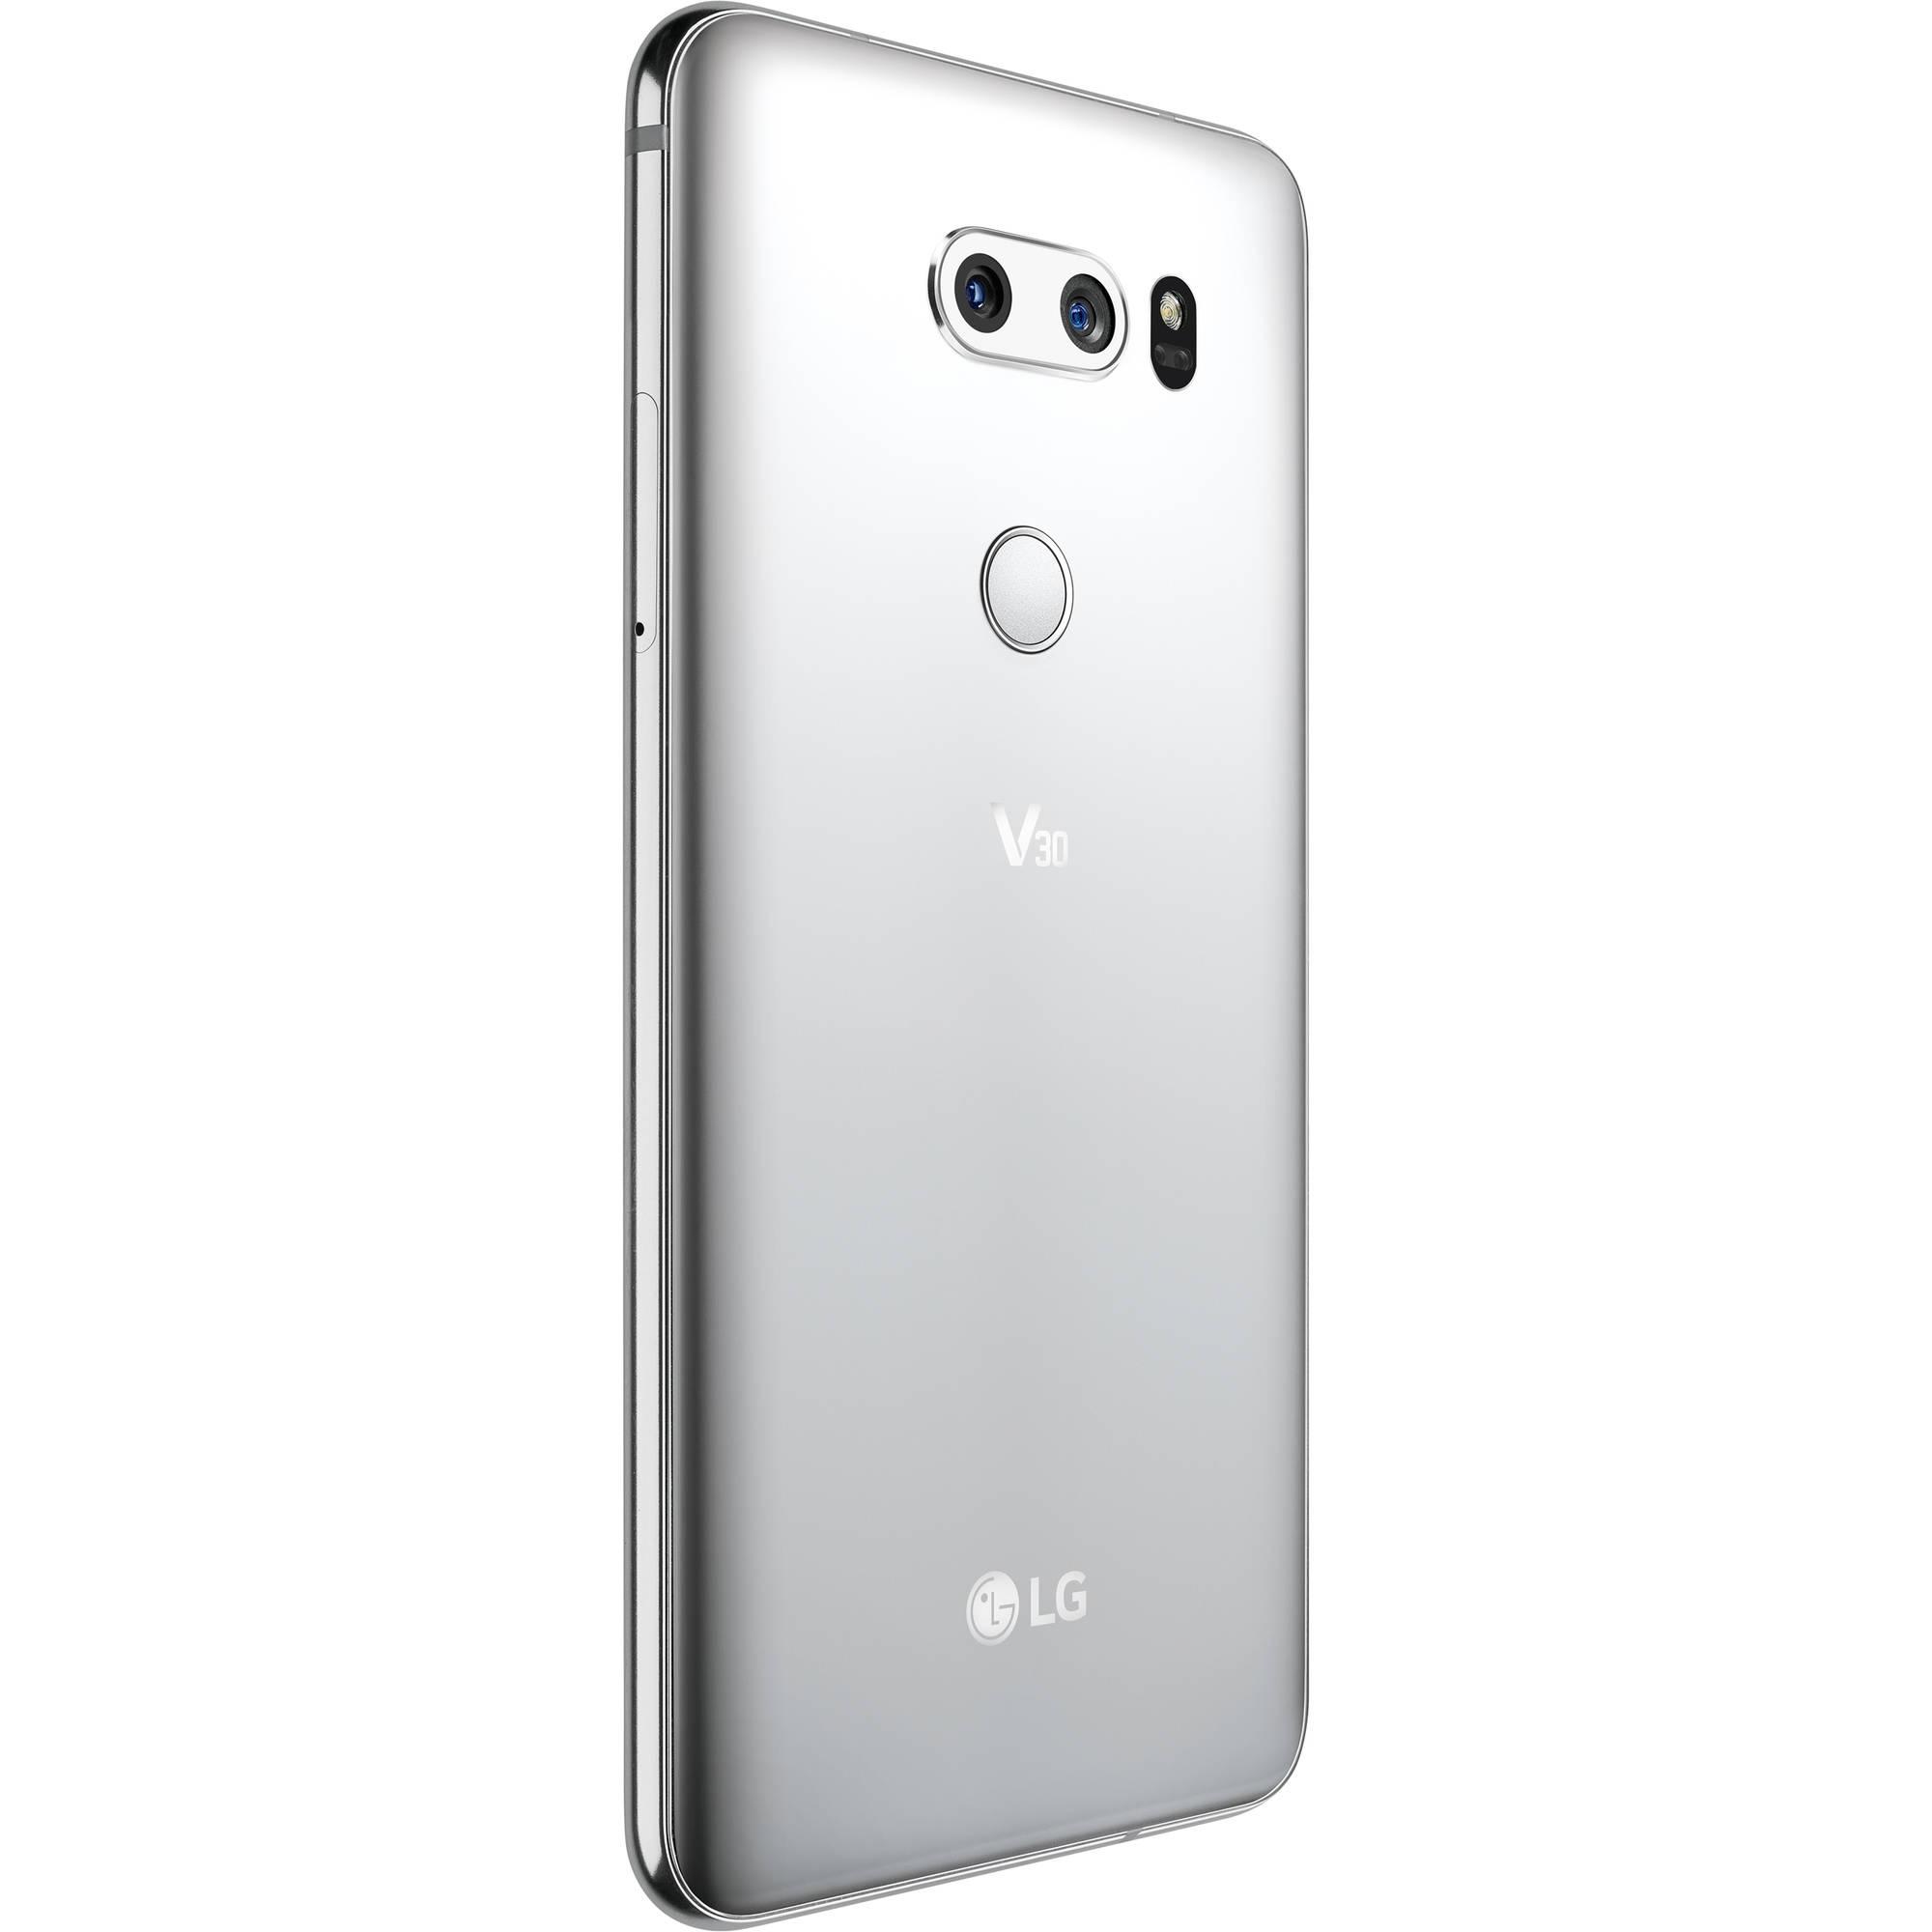 LG V30 US998 64GB Smartphone (Cloud Silver)